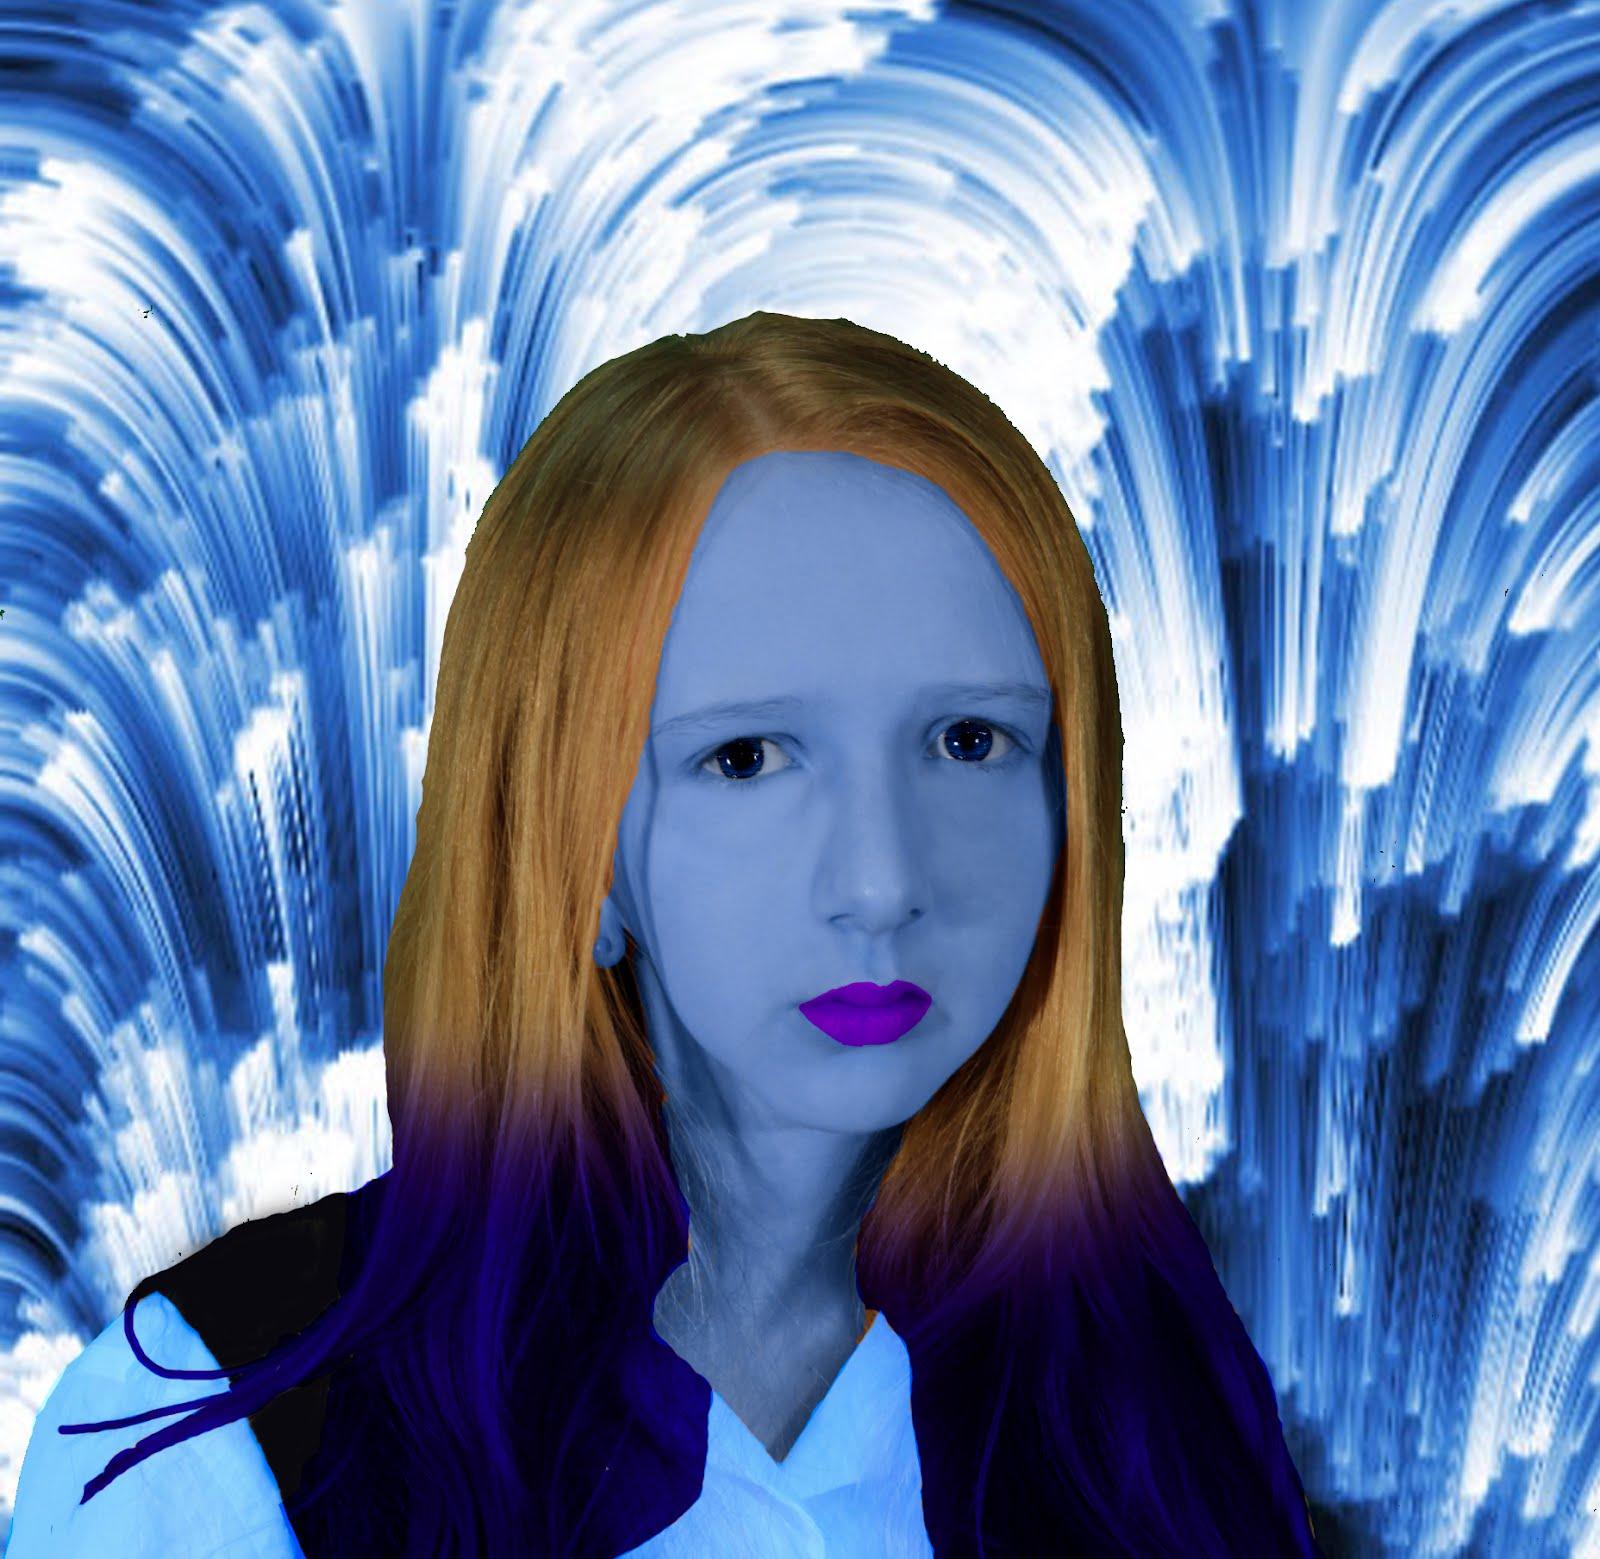 Creative Media: Sad Avatar 2